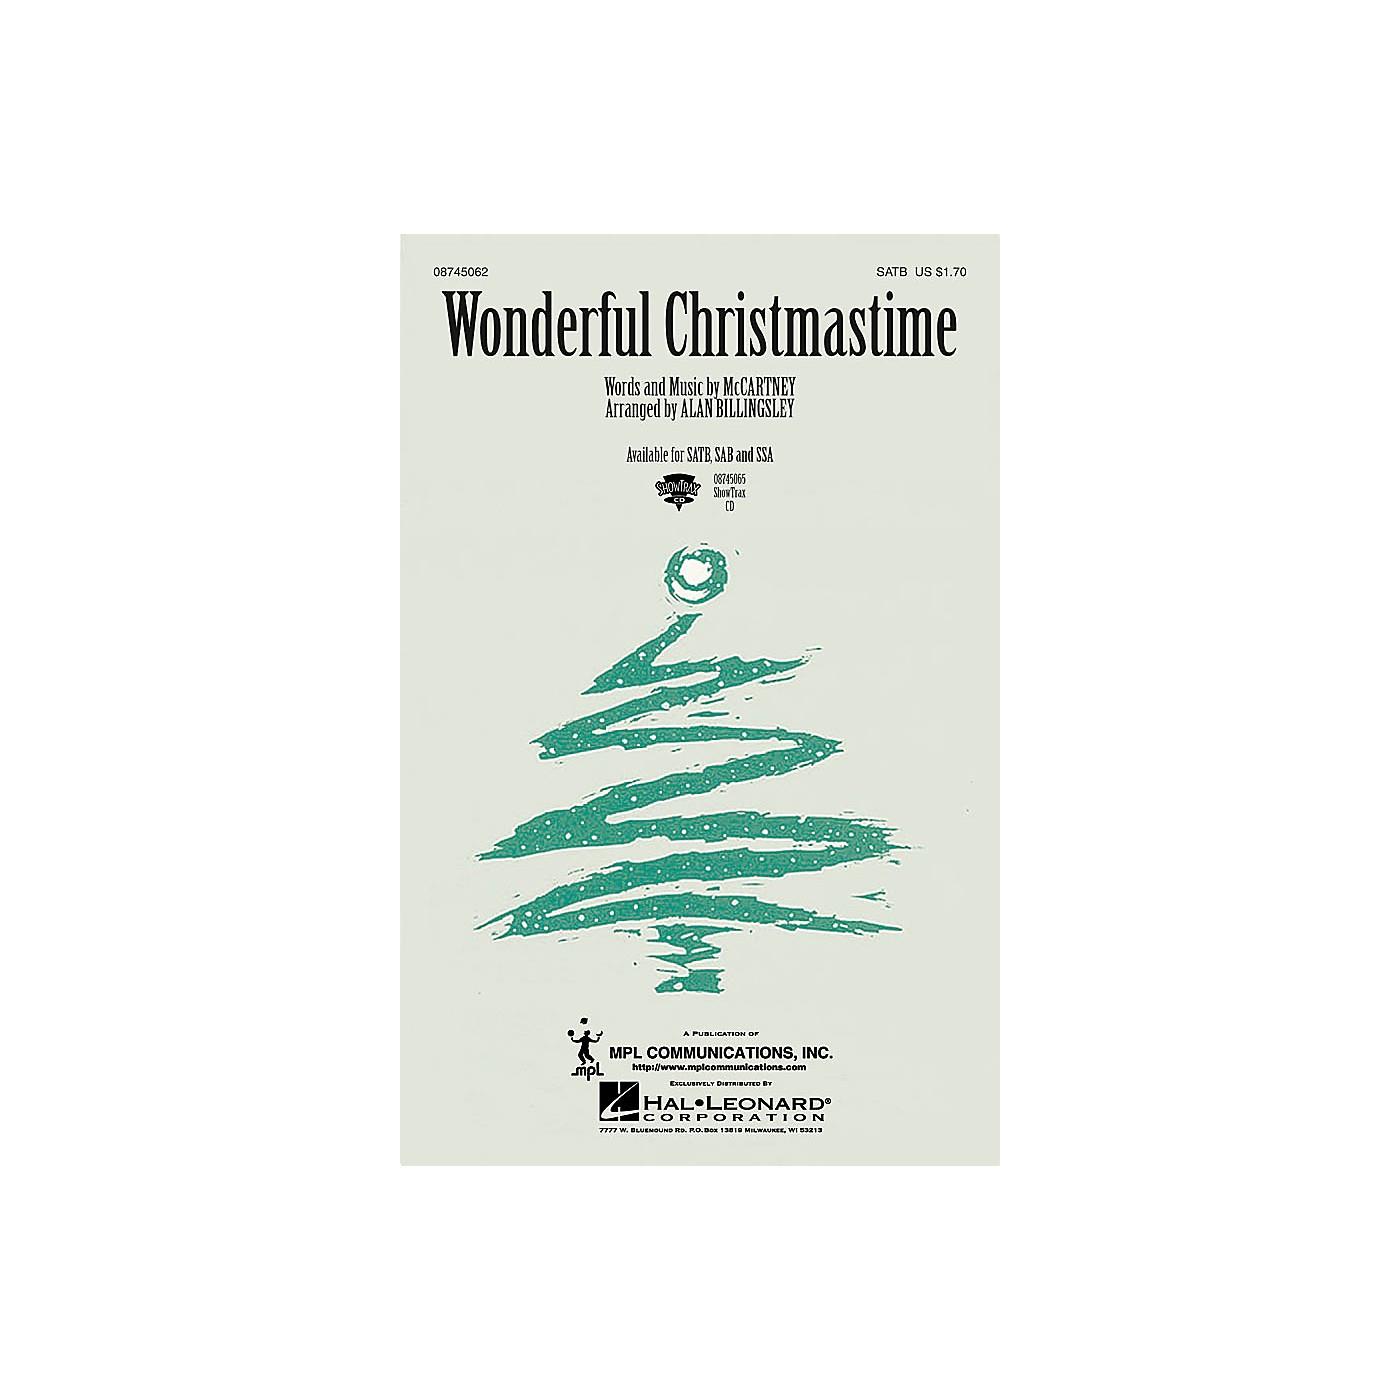 Hal Leonard Wonderful Christmastime ShowTrax CD by Paul McCartney Arranged by Alan Billingsley thumbnail